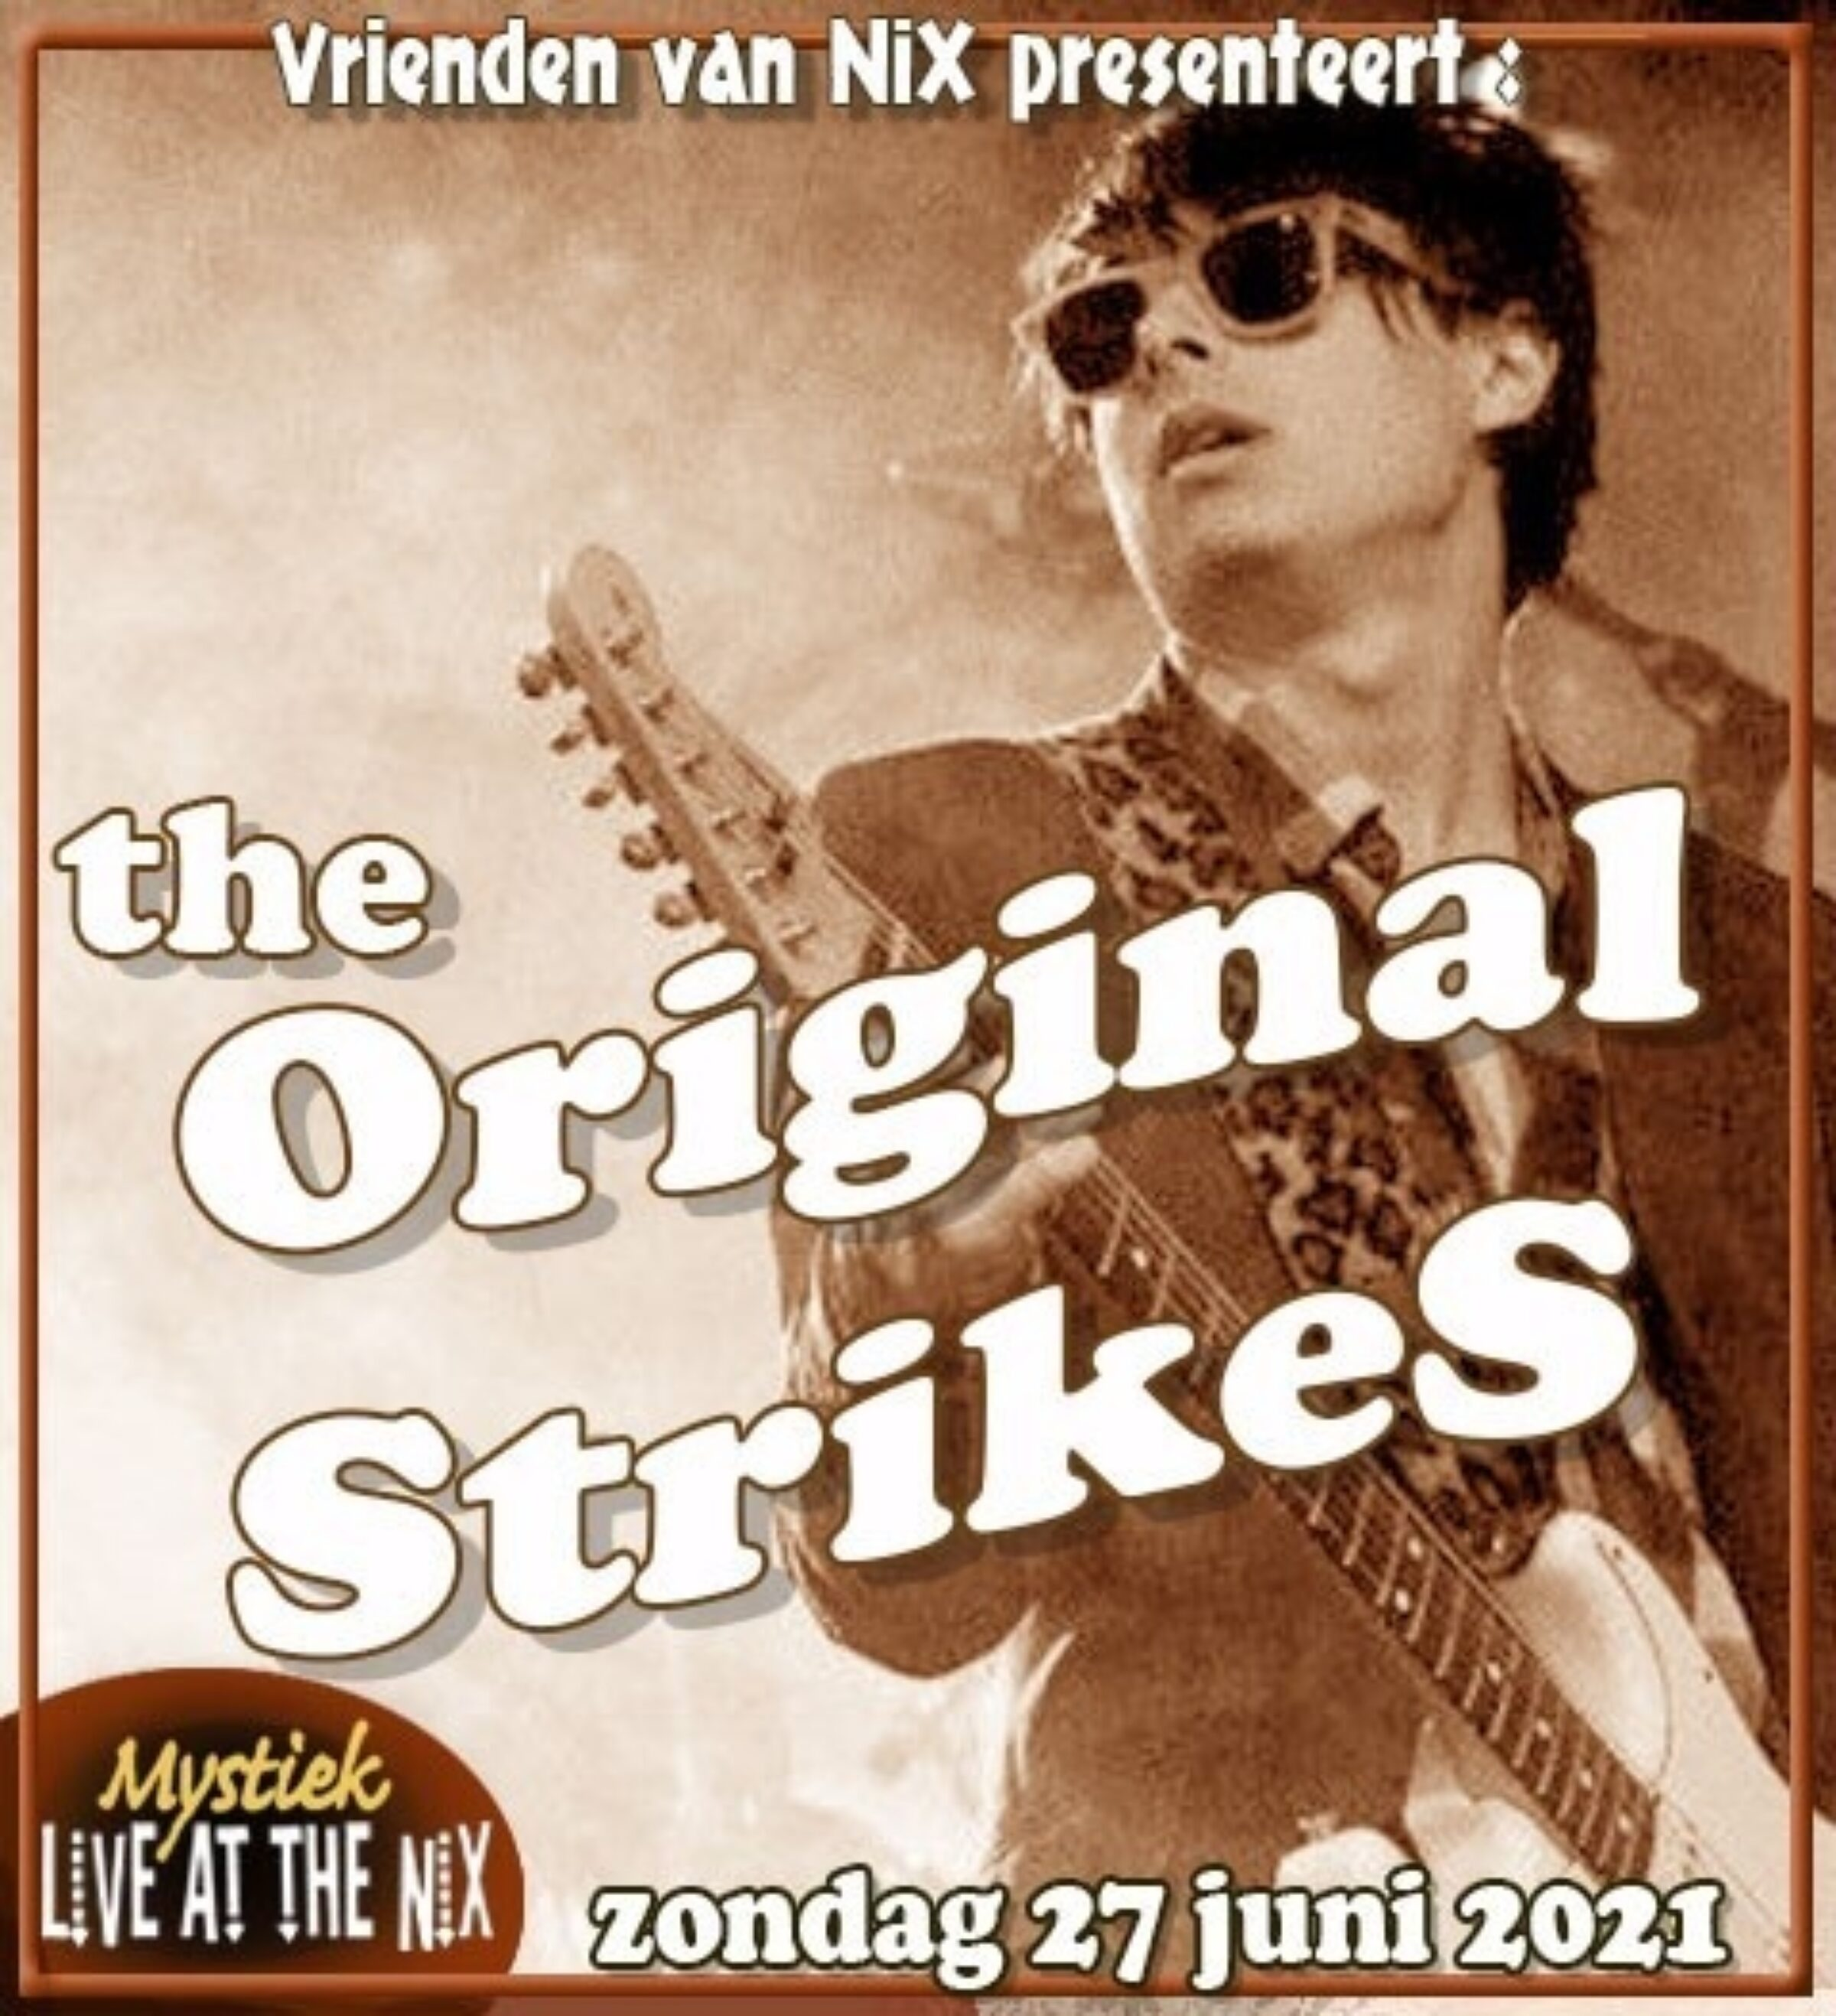 NIX Original Strikes